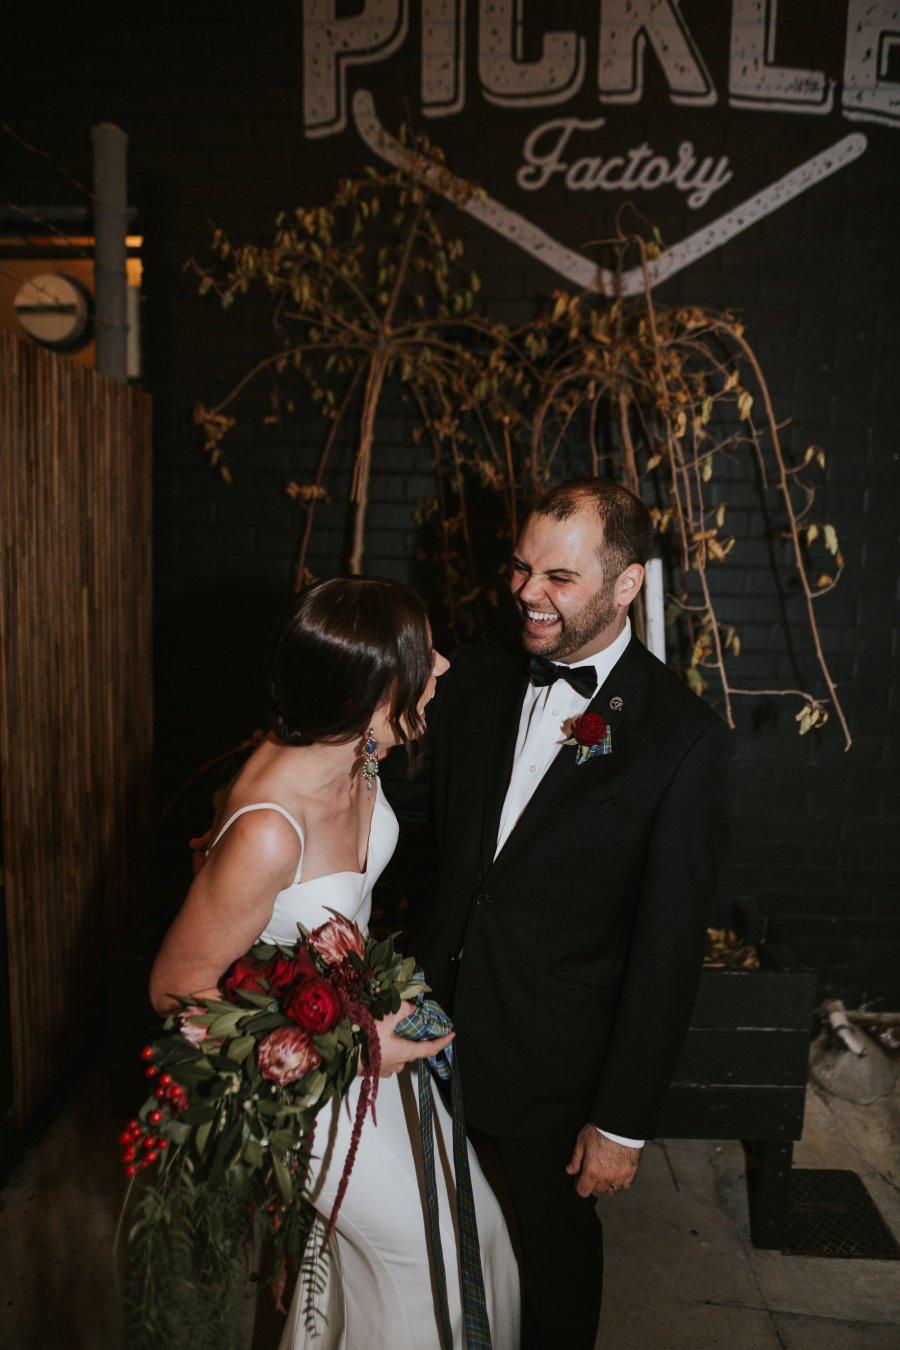 Old Pickle Factory Wedding | Perth Wedding Photographer | Night Wedding Perth | Ebony Blush Photography | Zoe Theiadore